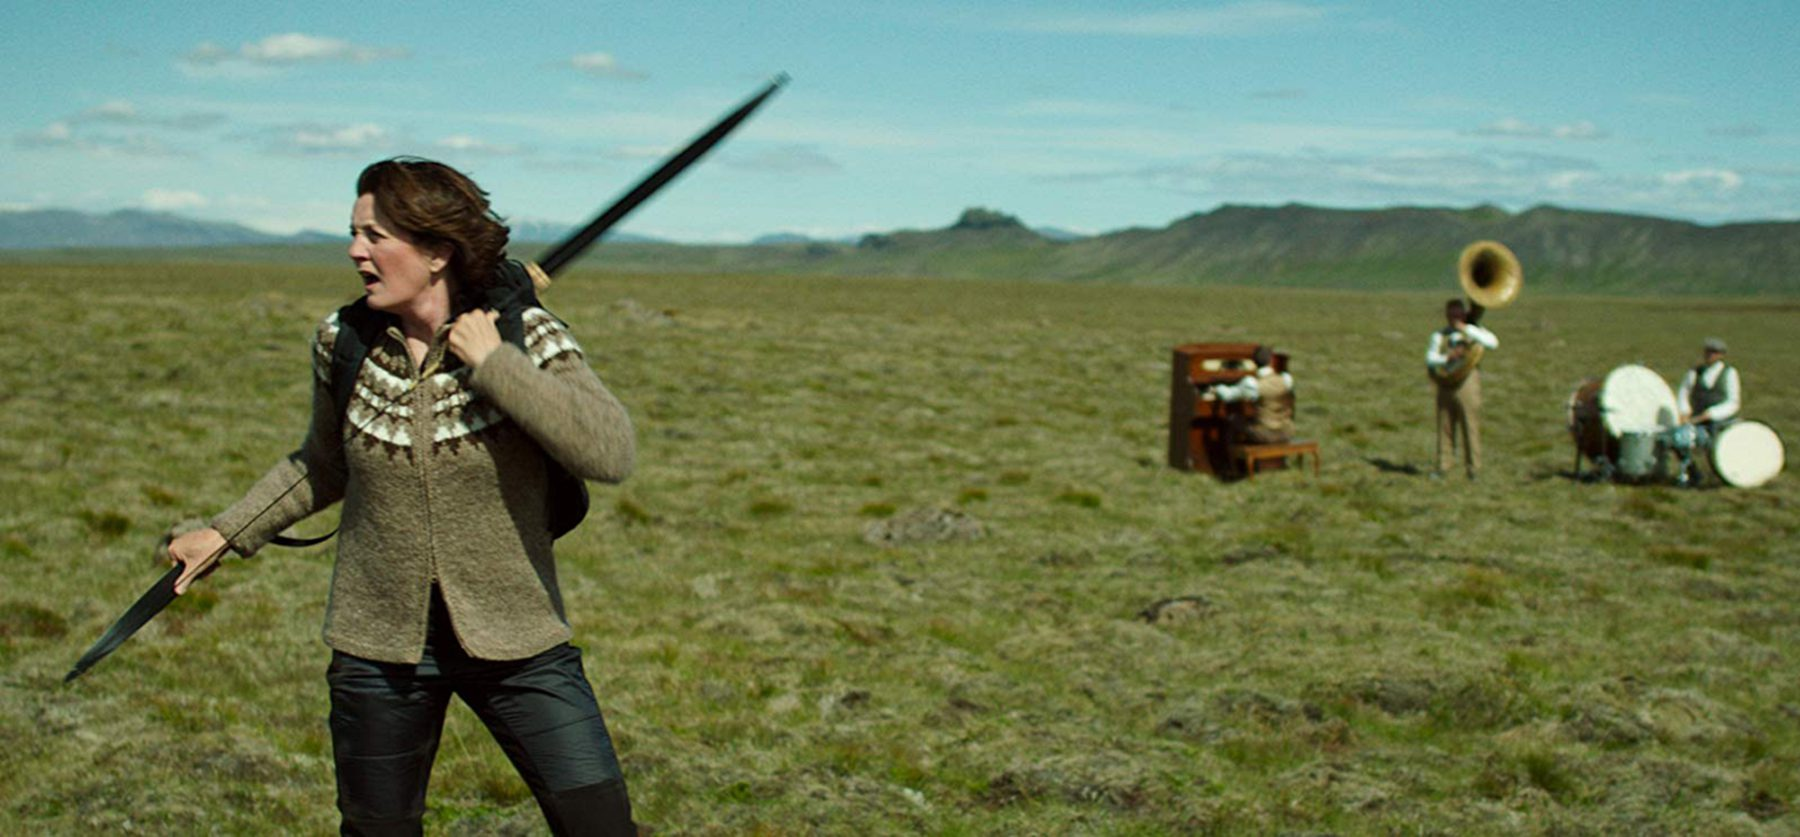 Woman at War' Review: Mother nature vs motherhood | Cinemacy